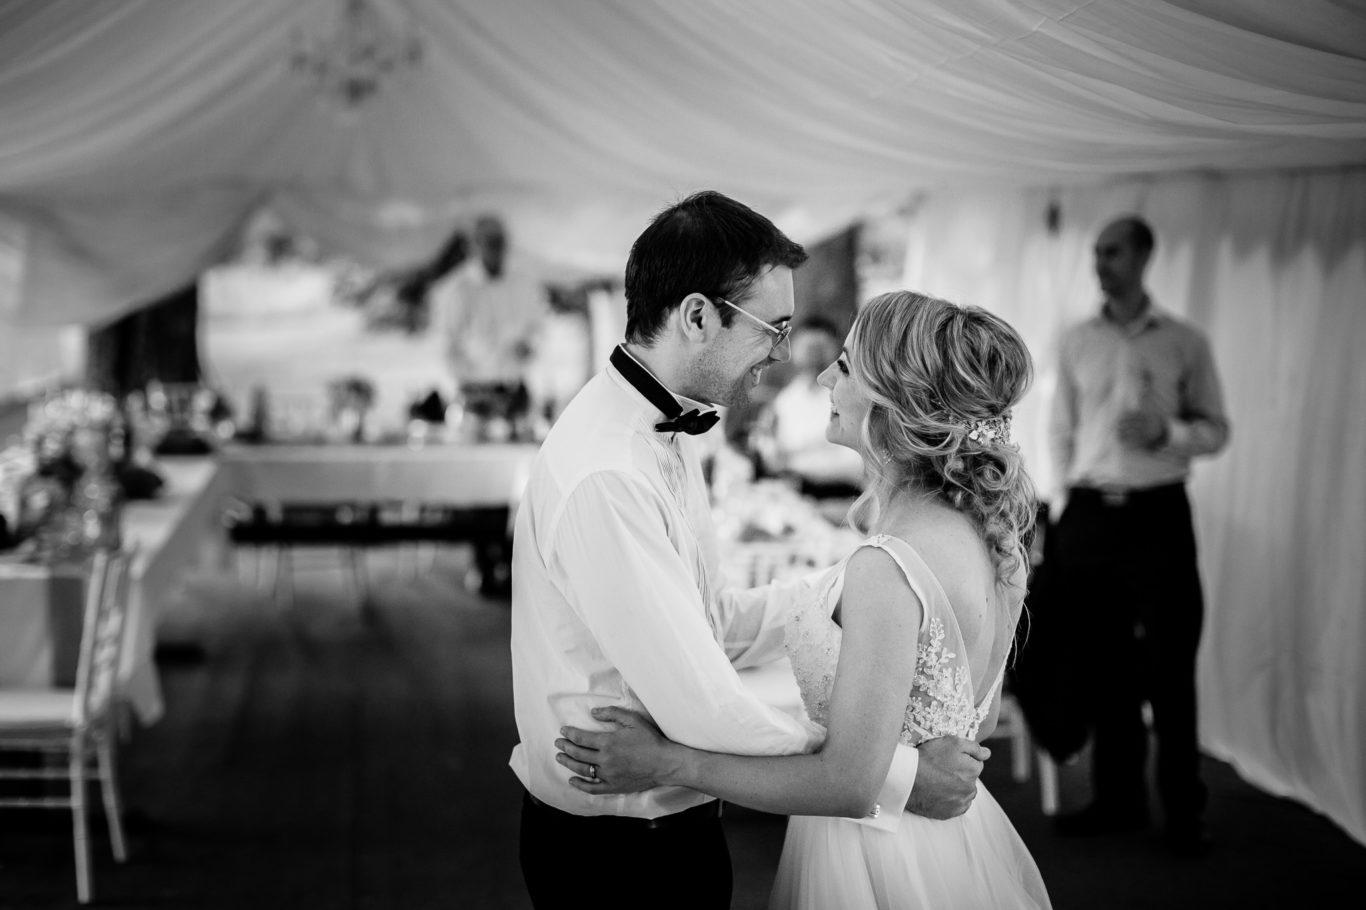 0563-fotografie-nunta-conacul-apafi-ana-simion-fotograf-ciprian-dumitrescu-cd2_1011